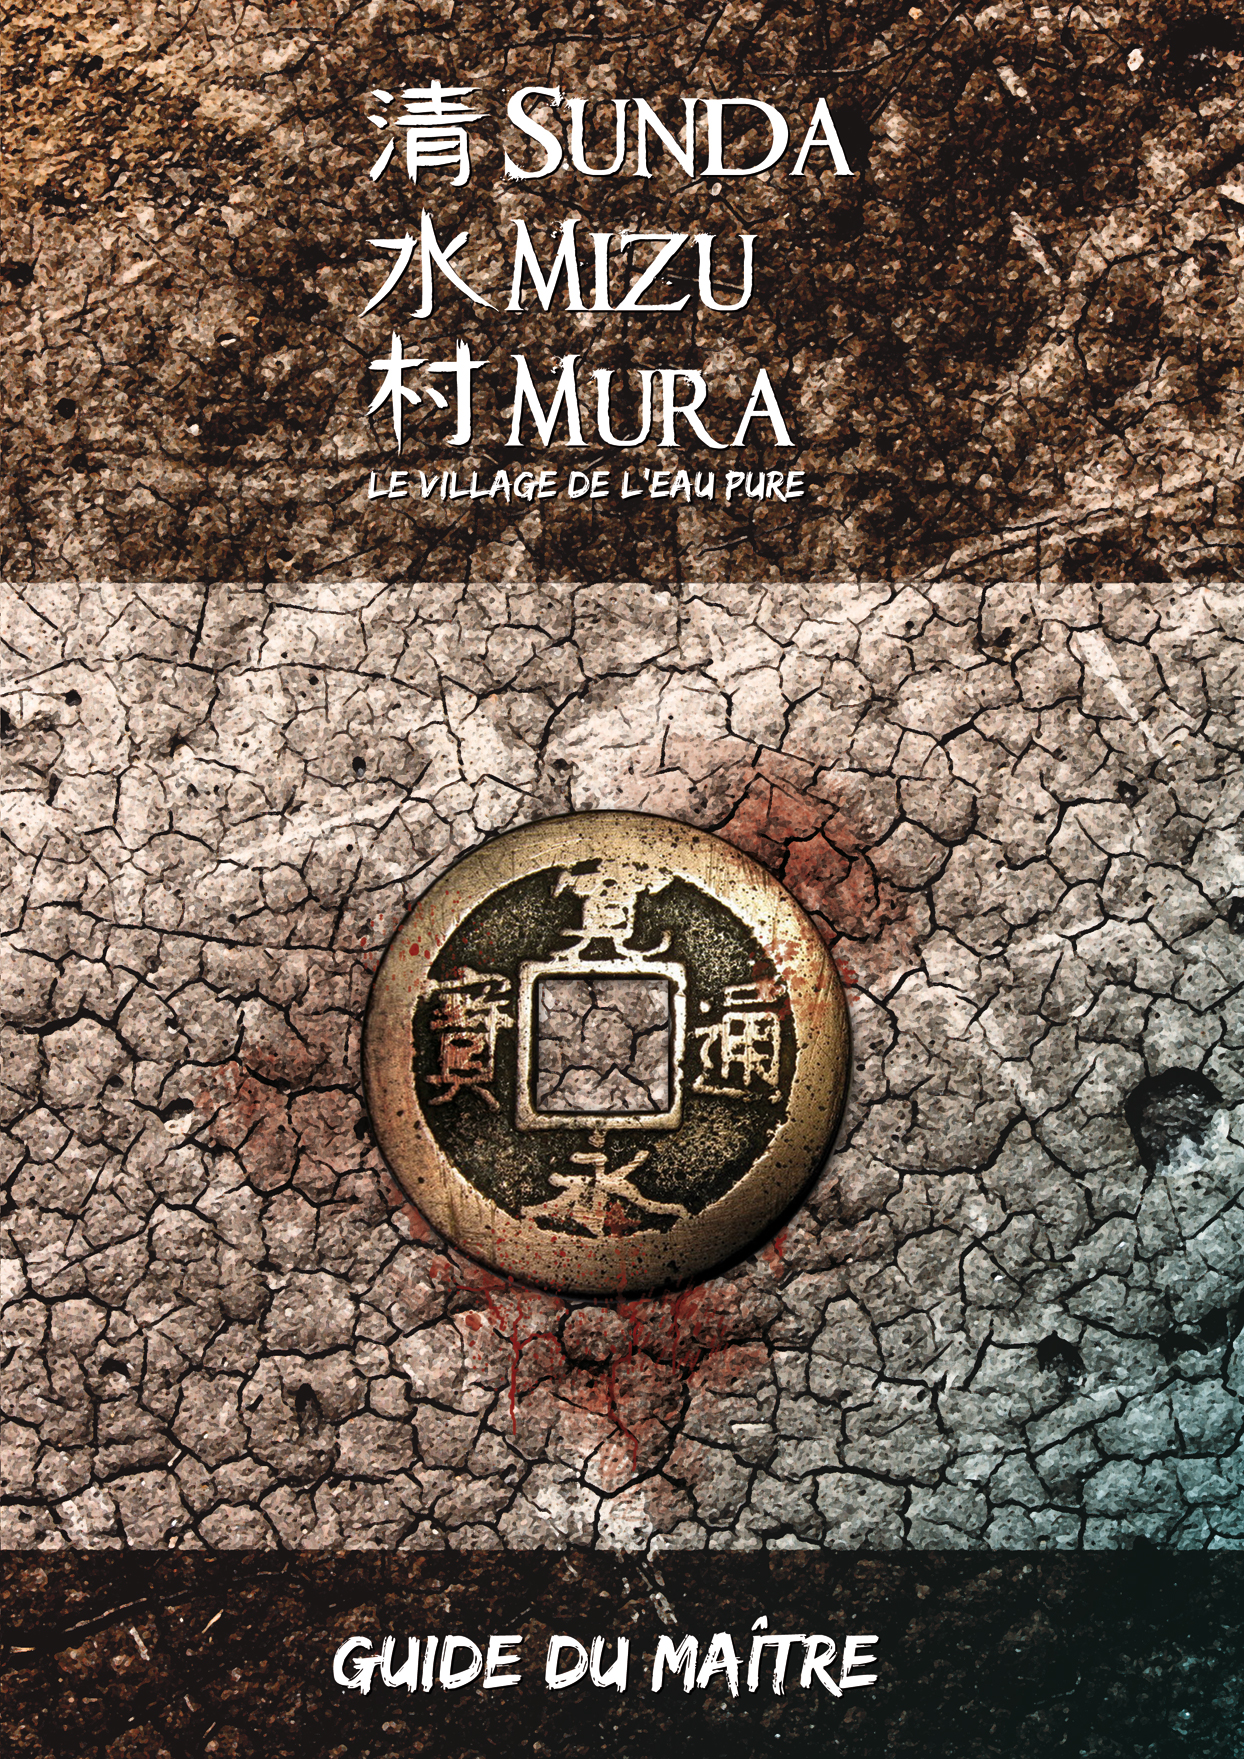 Sunda Mizu Mura - Guide du maître